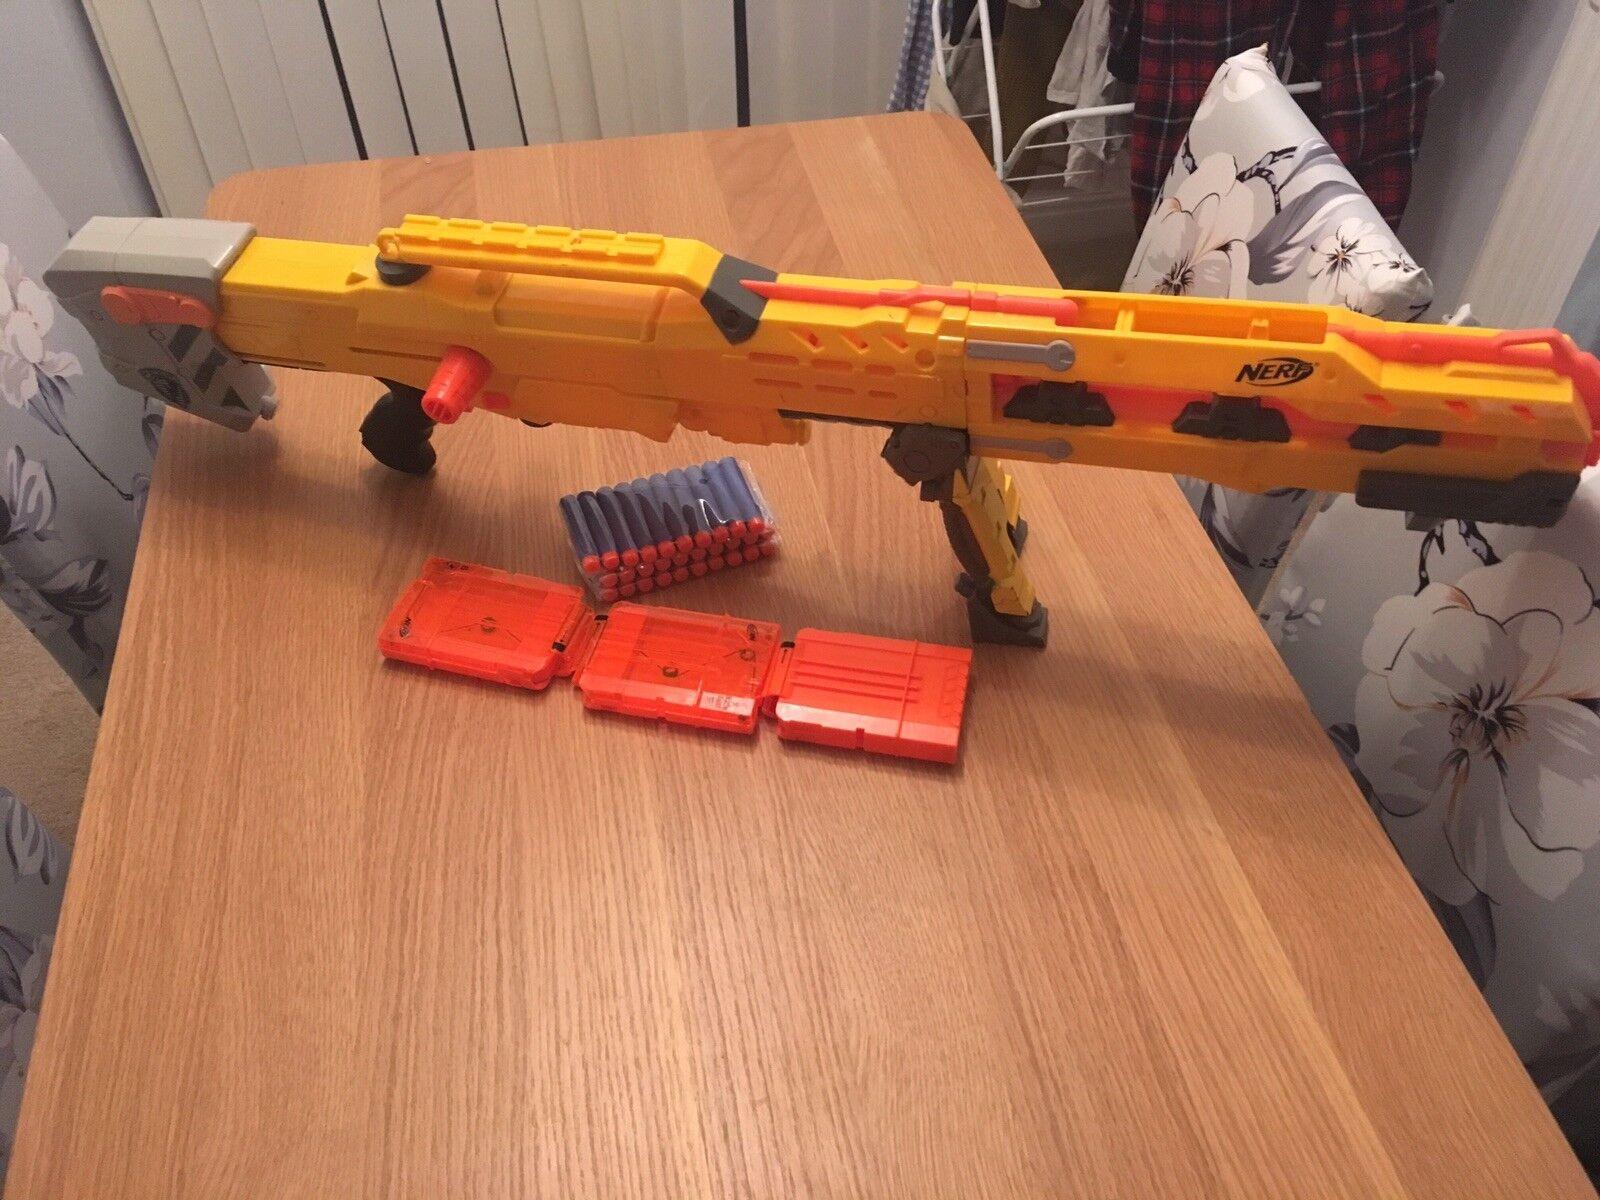 NERF N-Strike Longshot CS-6 Blaster Gun & & & Ammo Bullets cc77a0